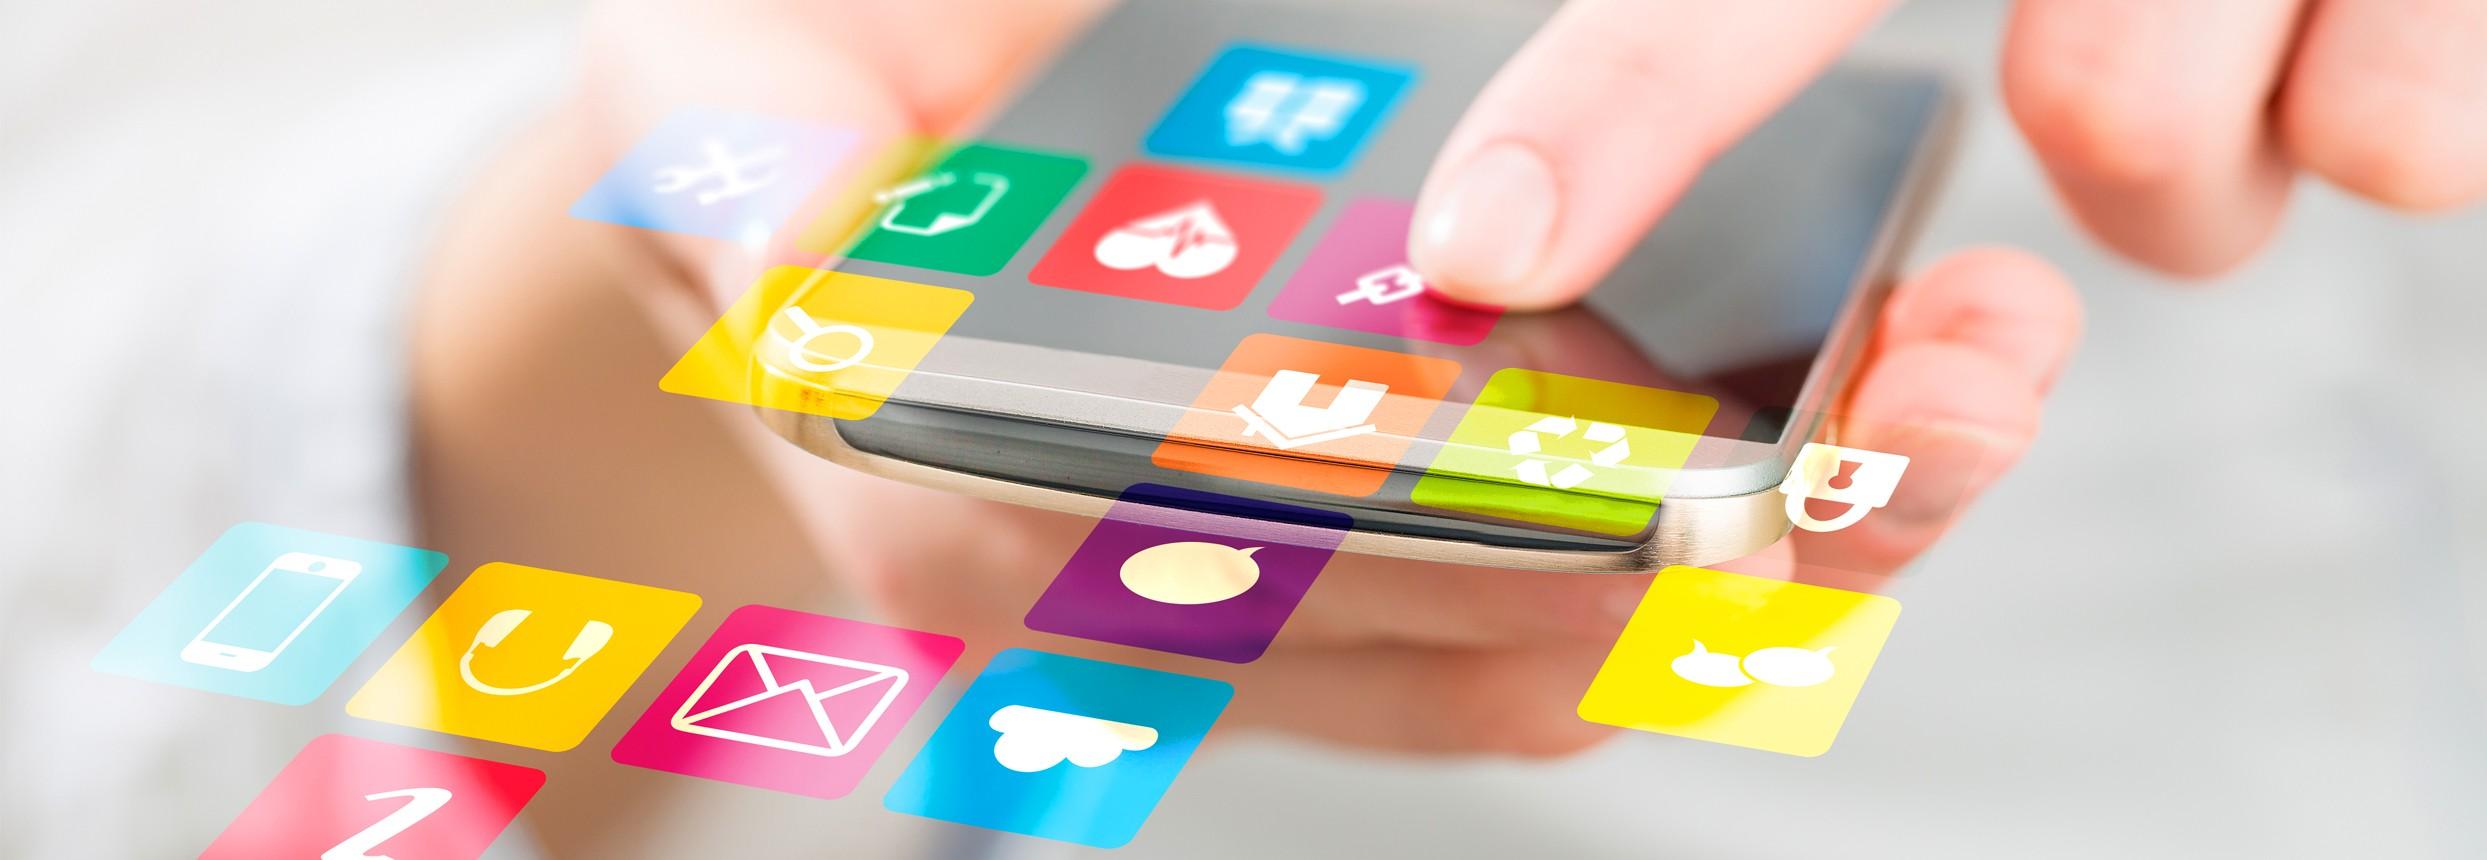 Branding 2017: Digital & Traditional is Key